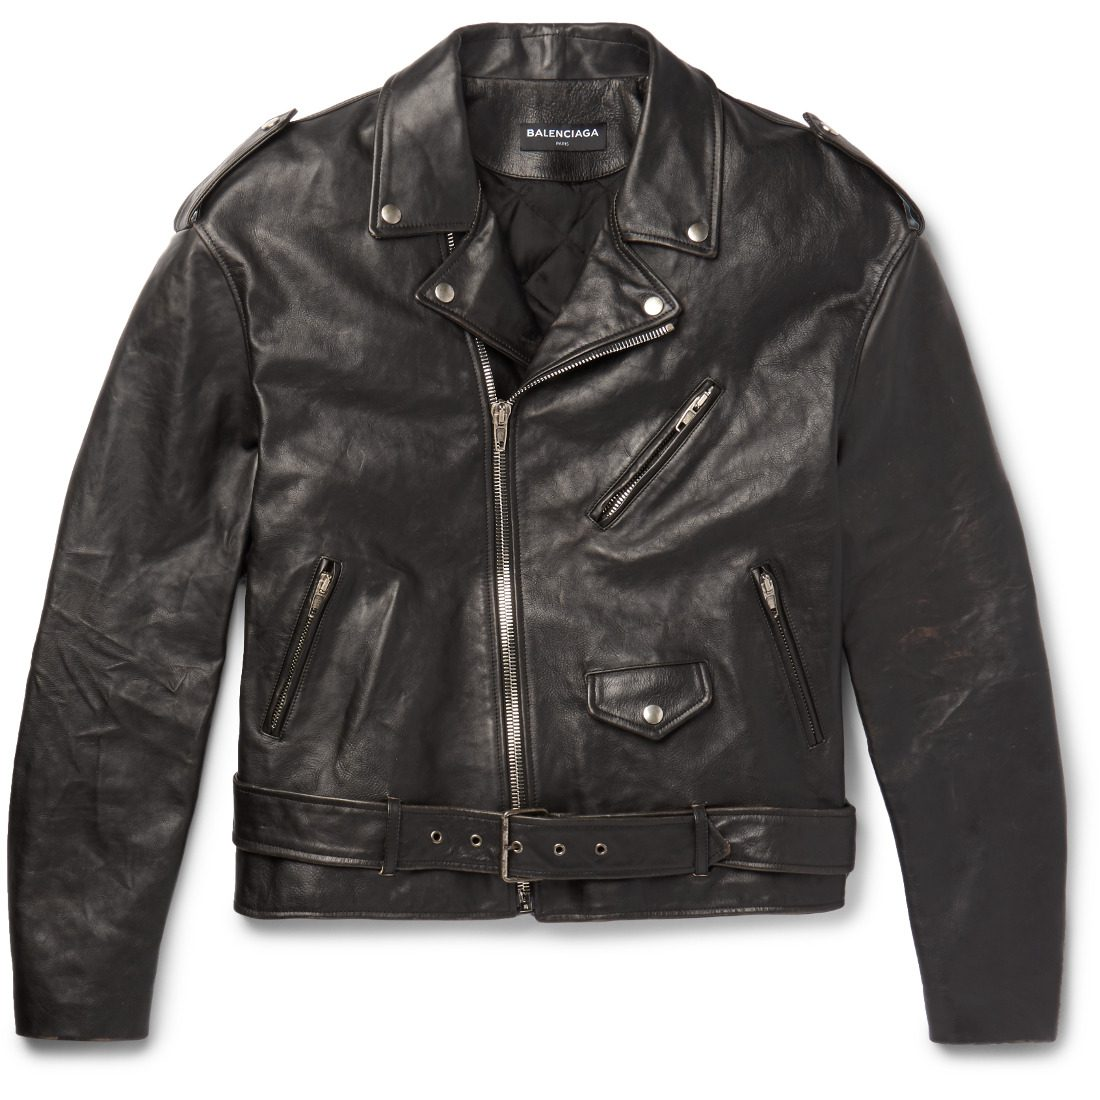 mr-porter-x-balenciaga-paint-logo-leather-biker-jacket-1000352_mrp_in